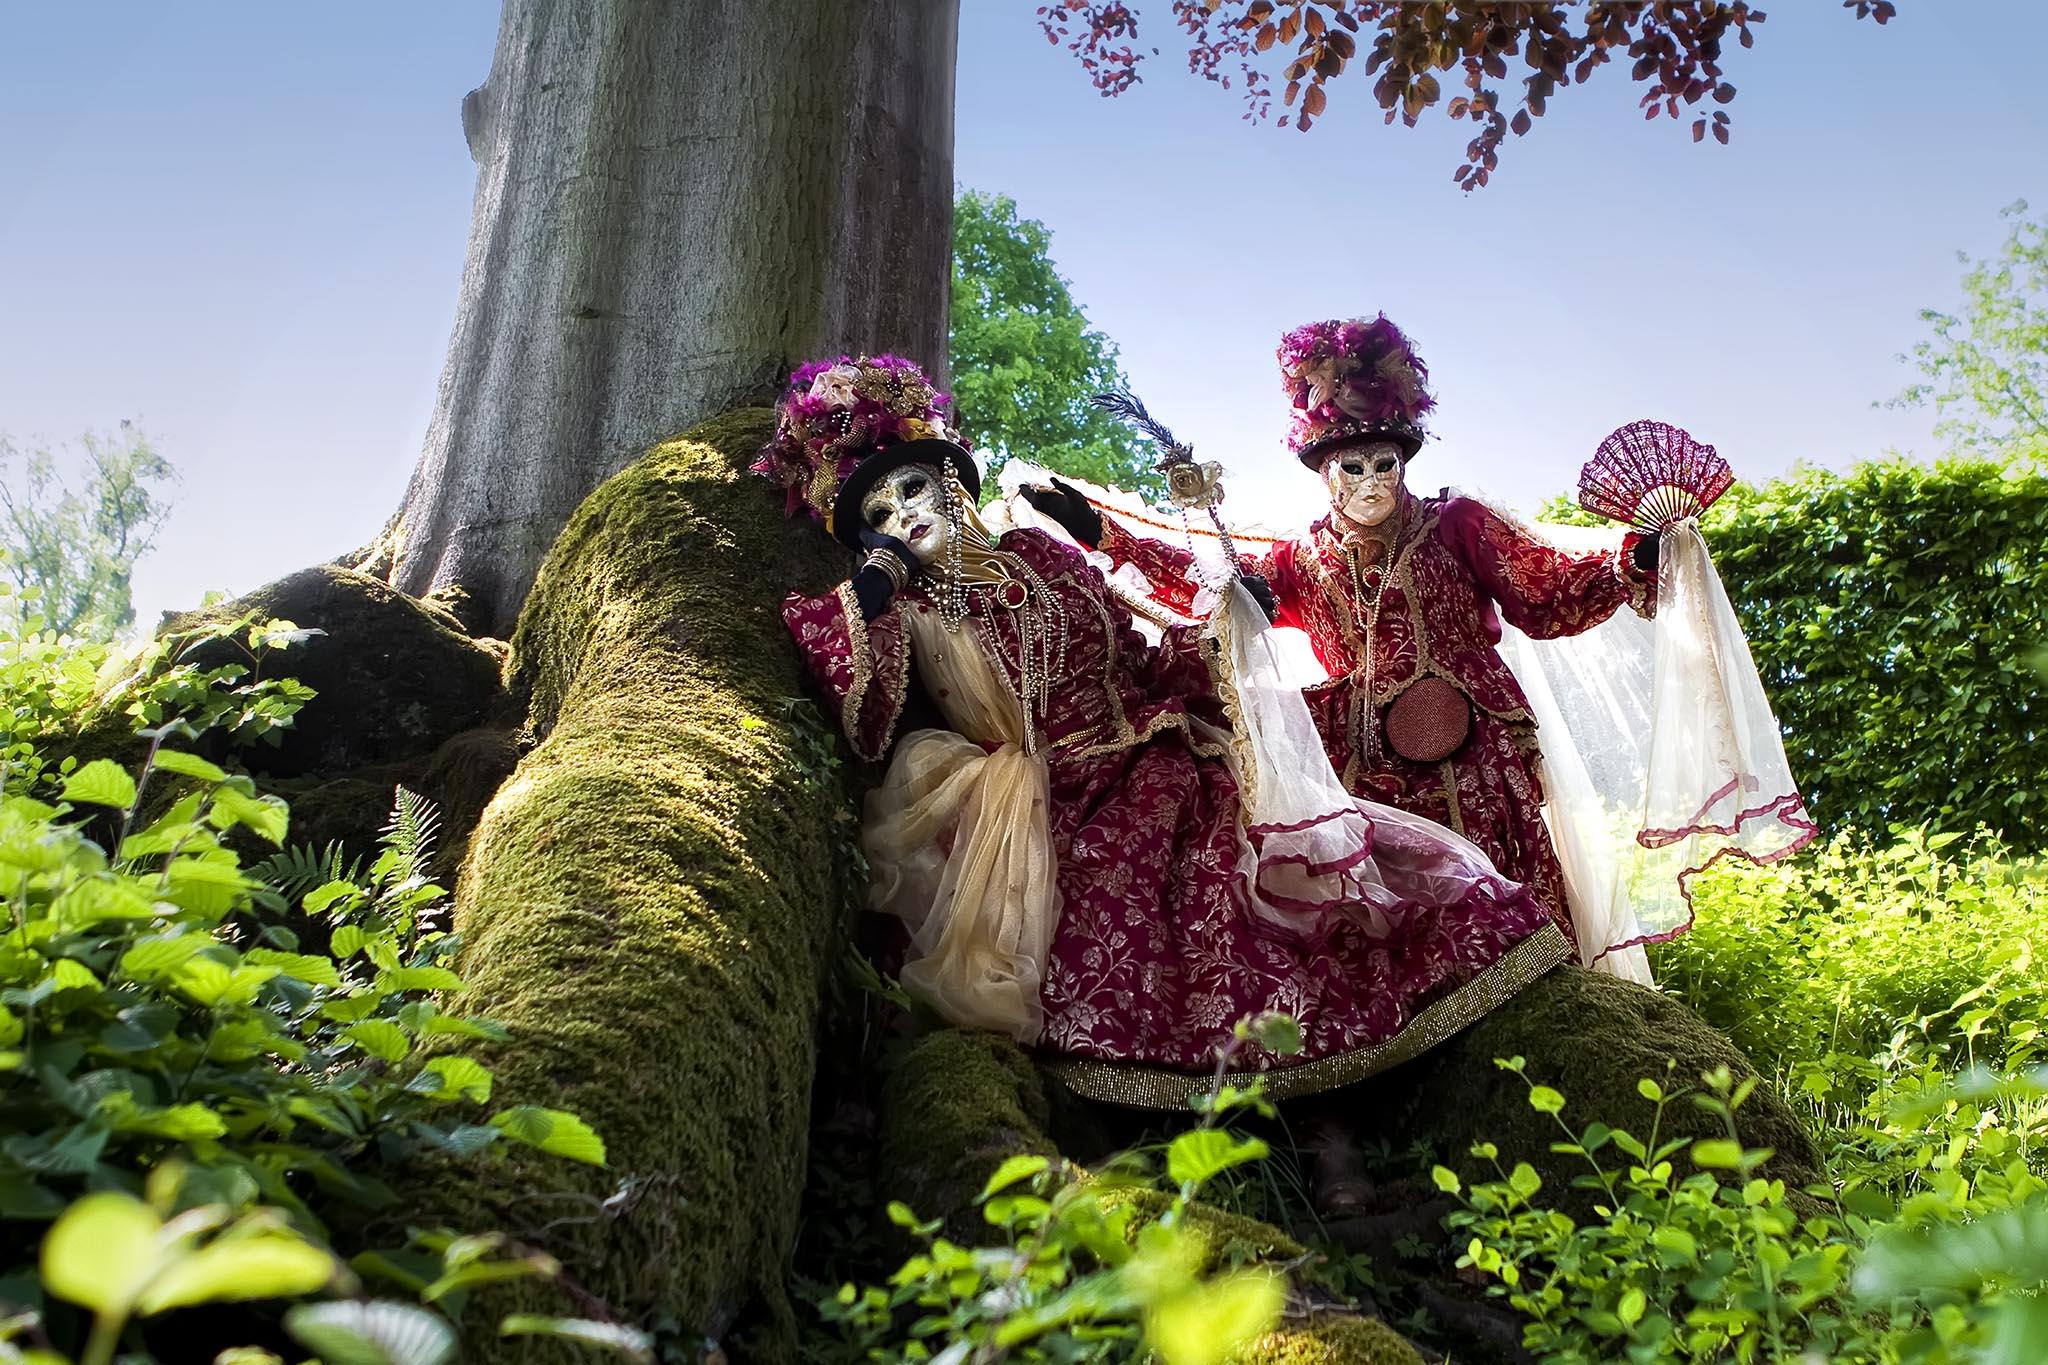 Melinda Isachsen JANIS Photography & Fine Art Annevoie Belgium